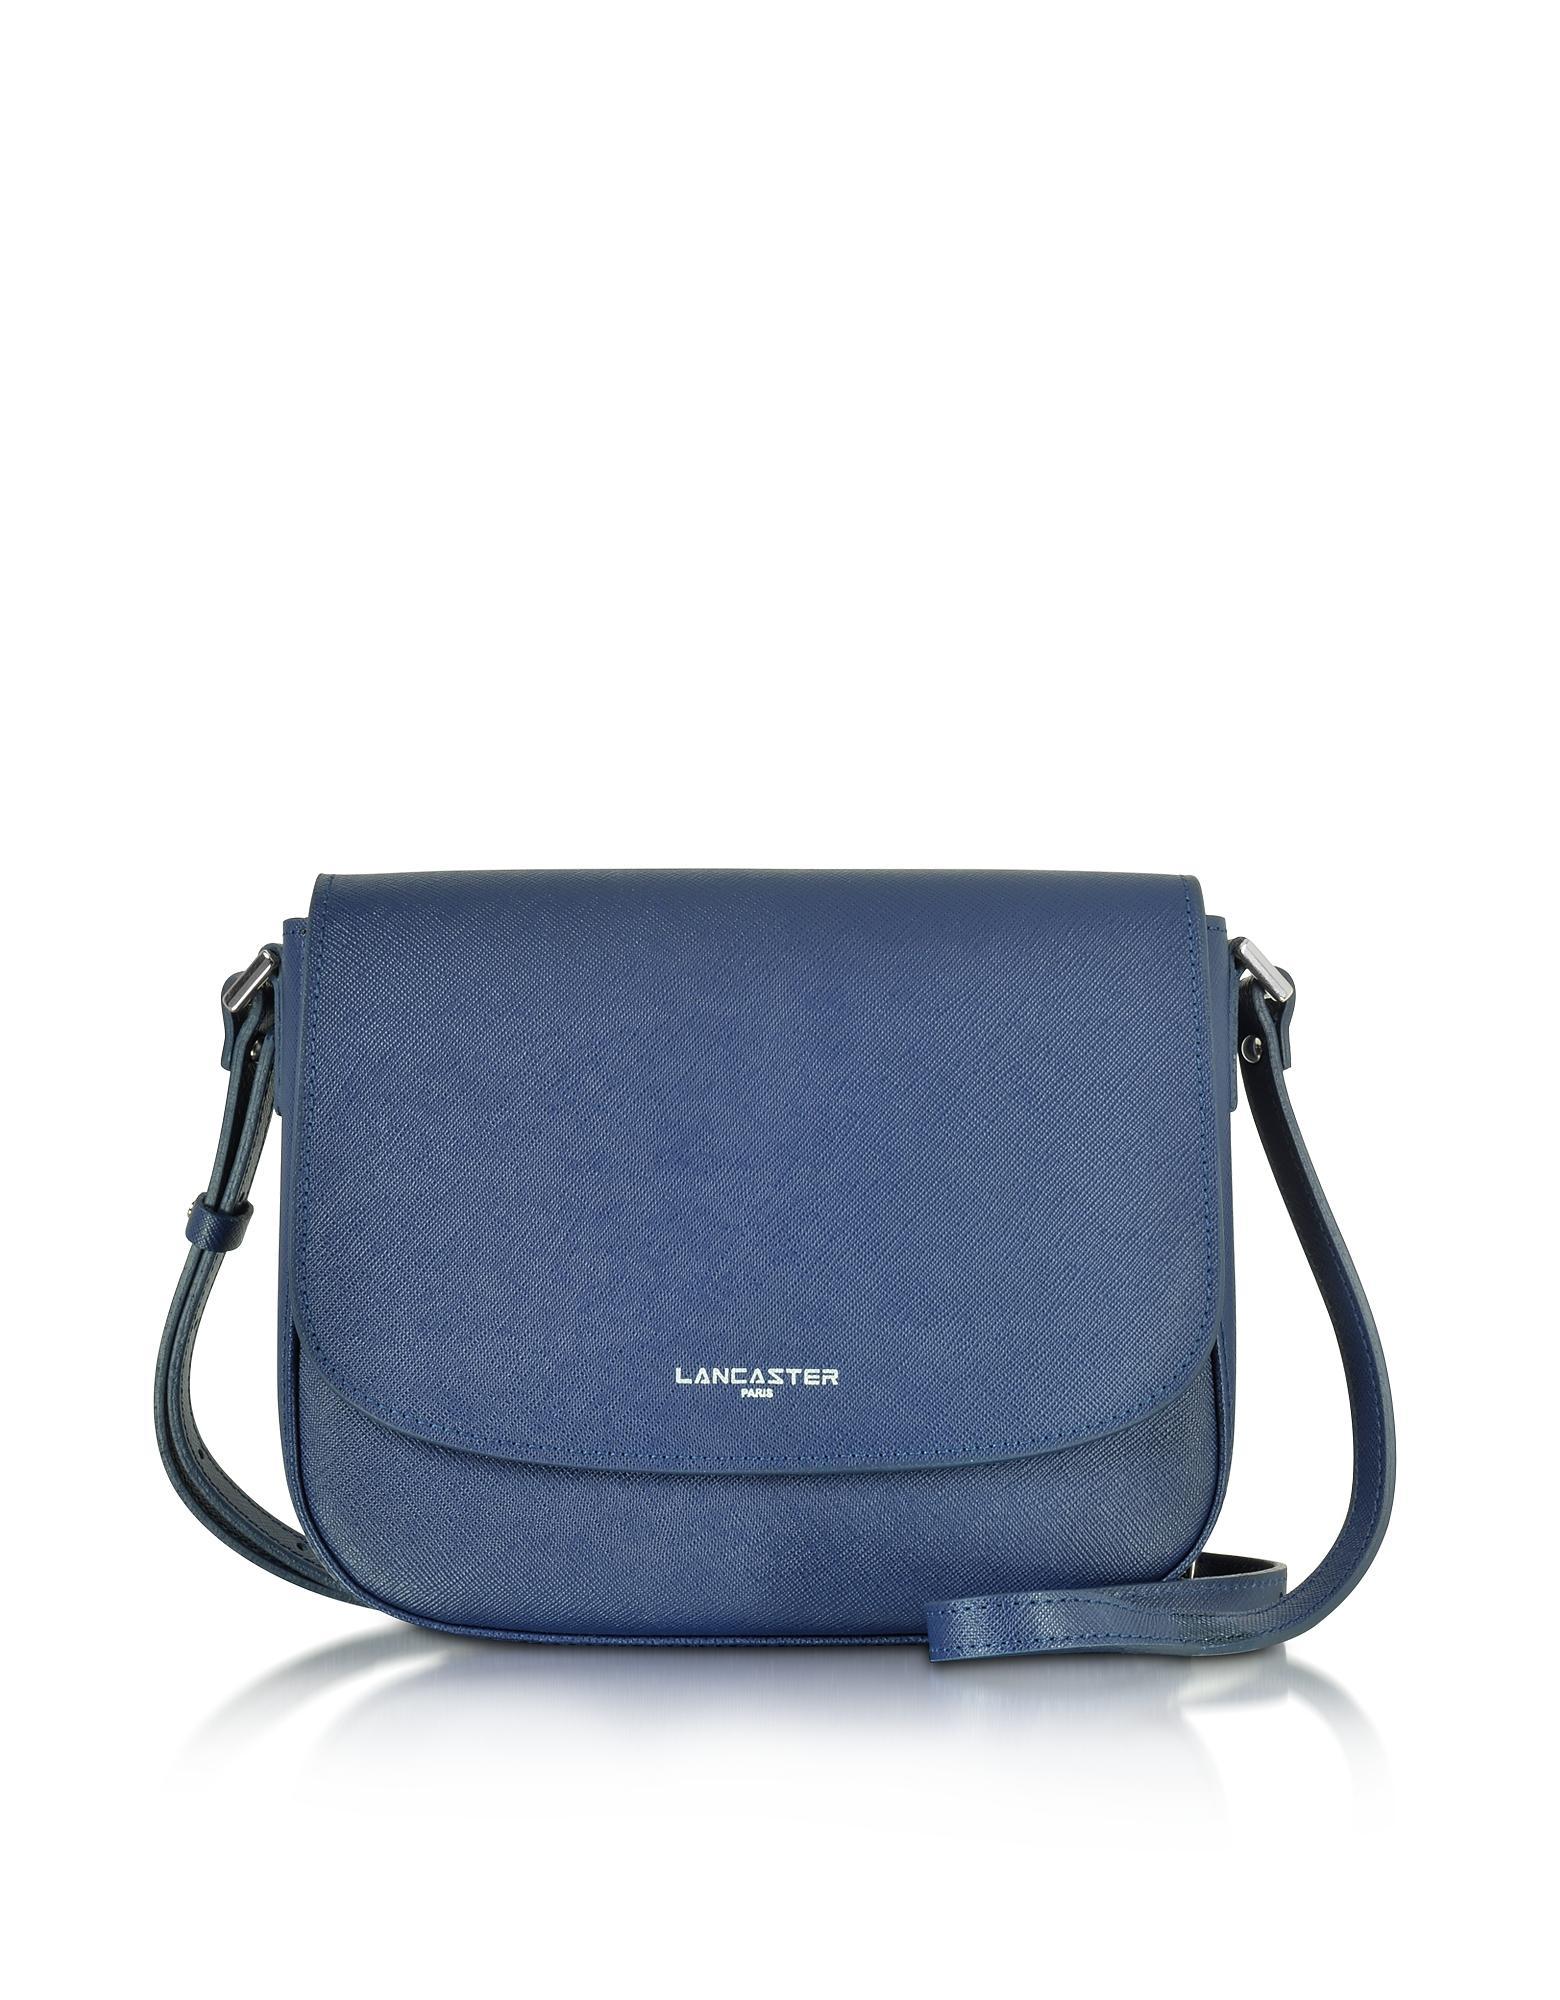 48db529c60ca Lancaster Paris Adele Saffiano Leather Crossbody Bag in Blue - Lyst